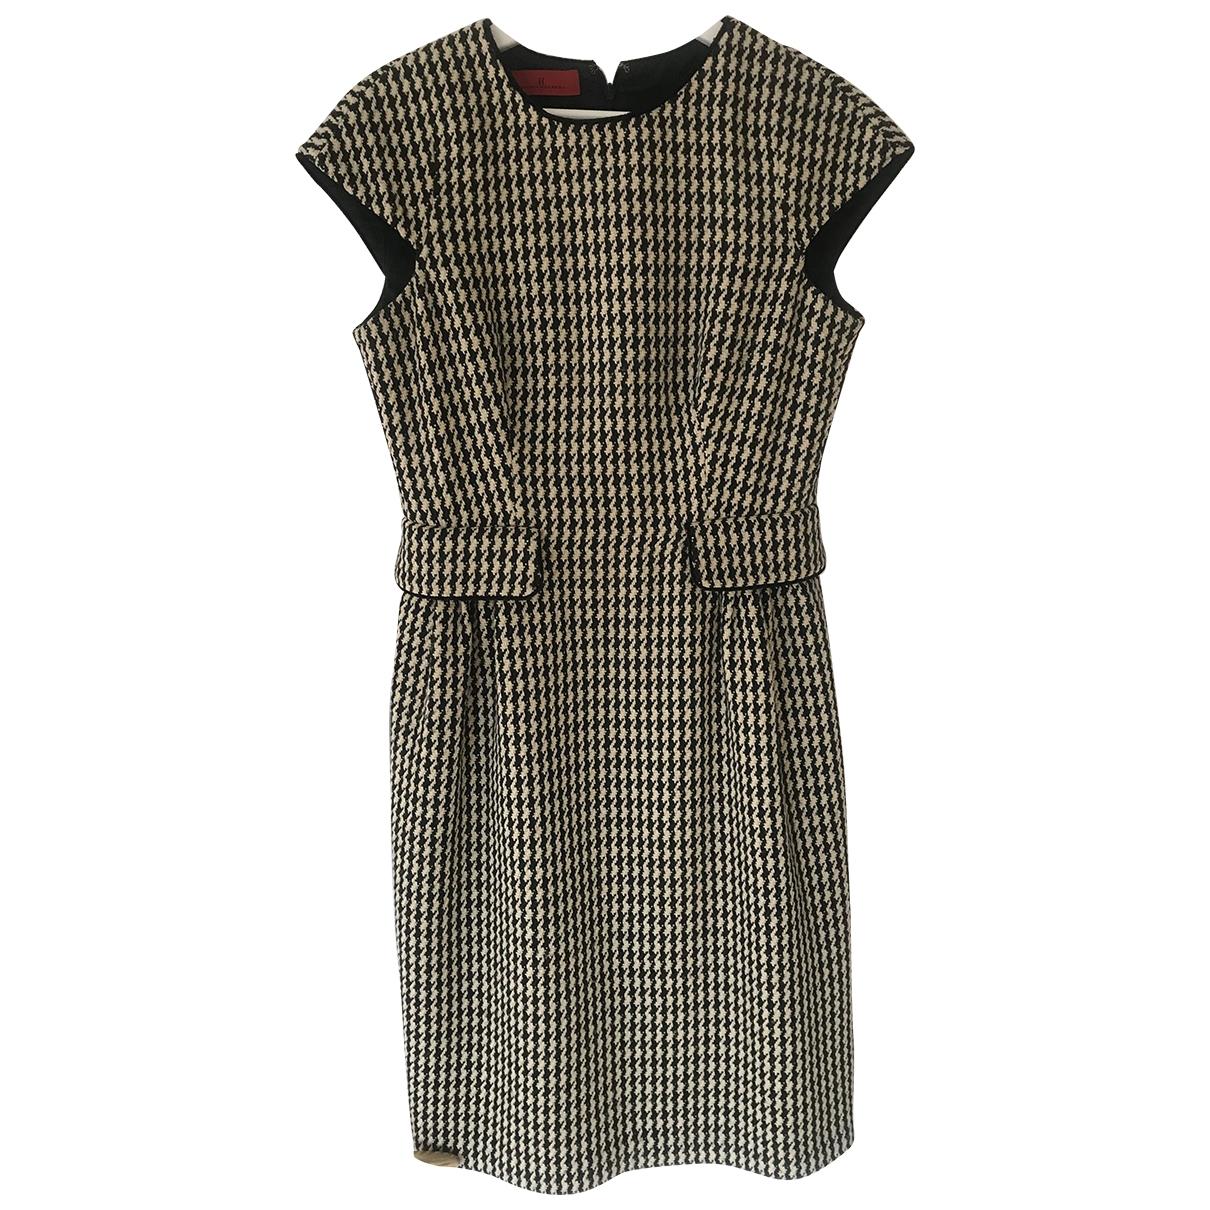 Carolina Herrera - Robe   pour femme en laine - multicolore